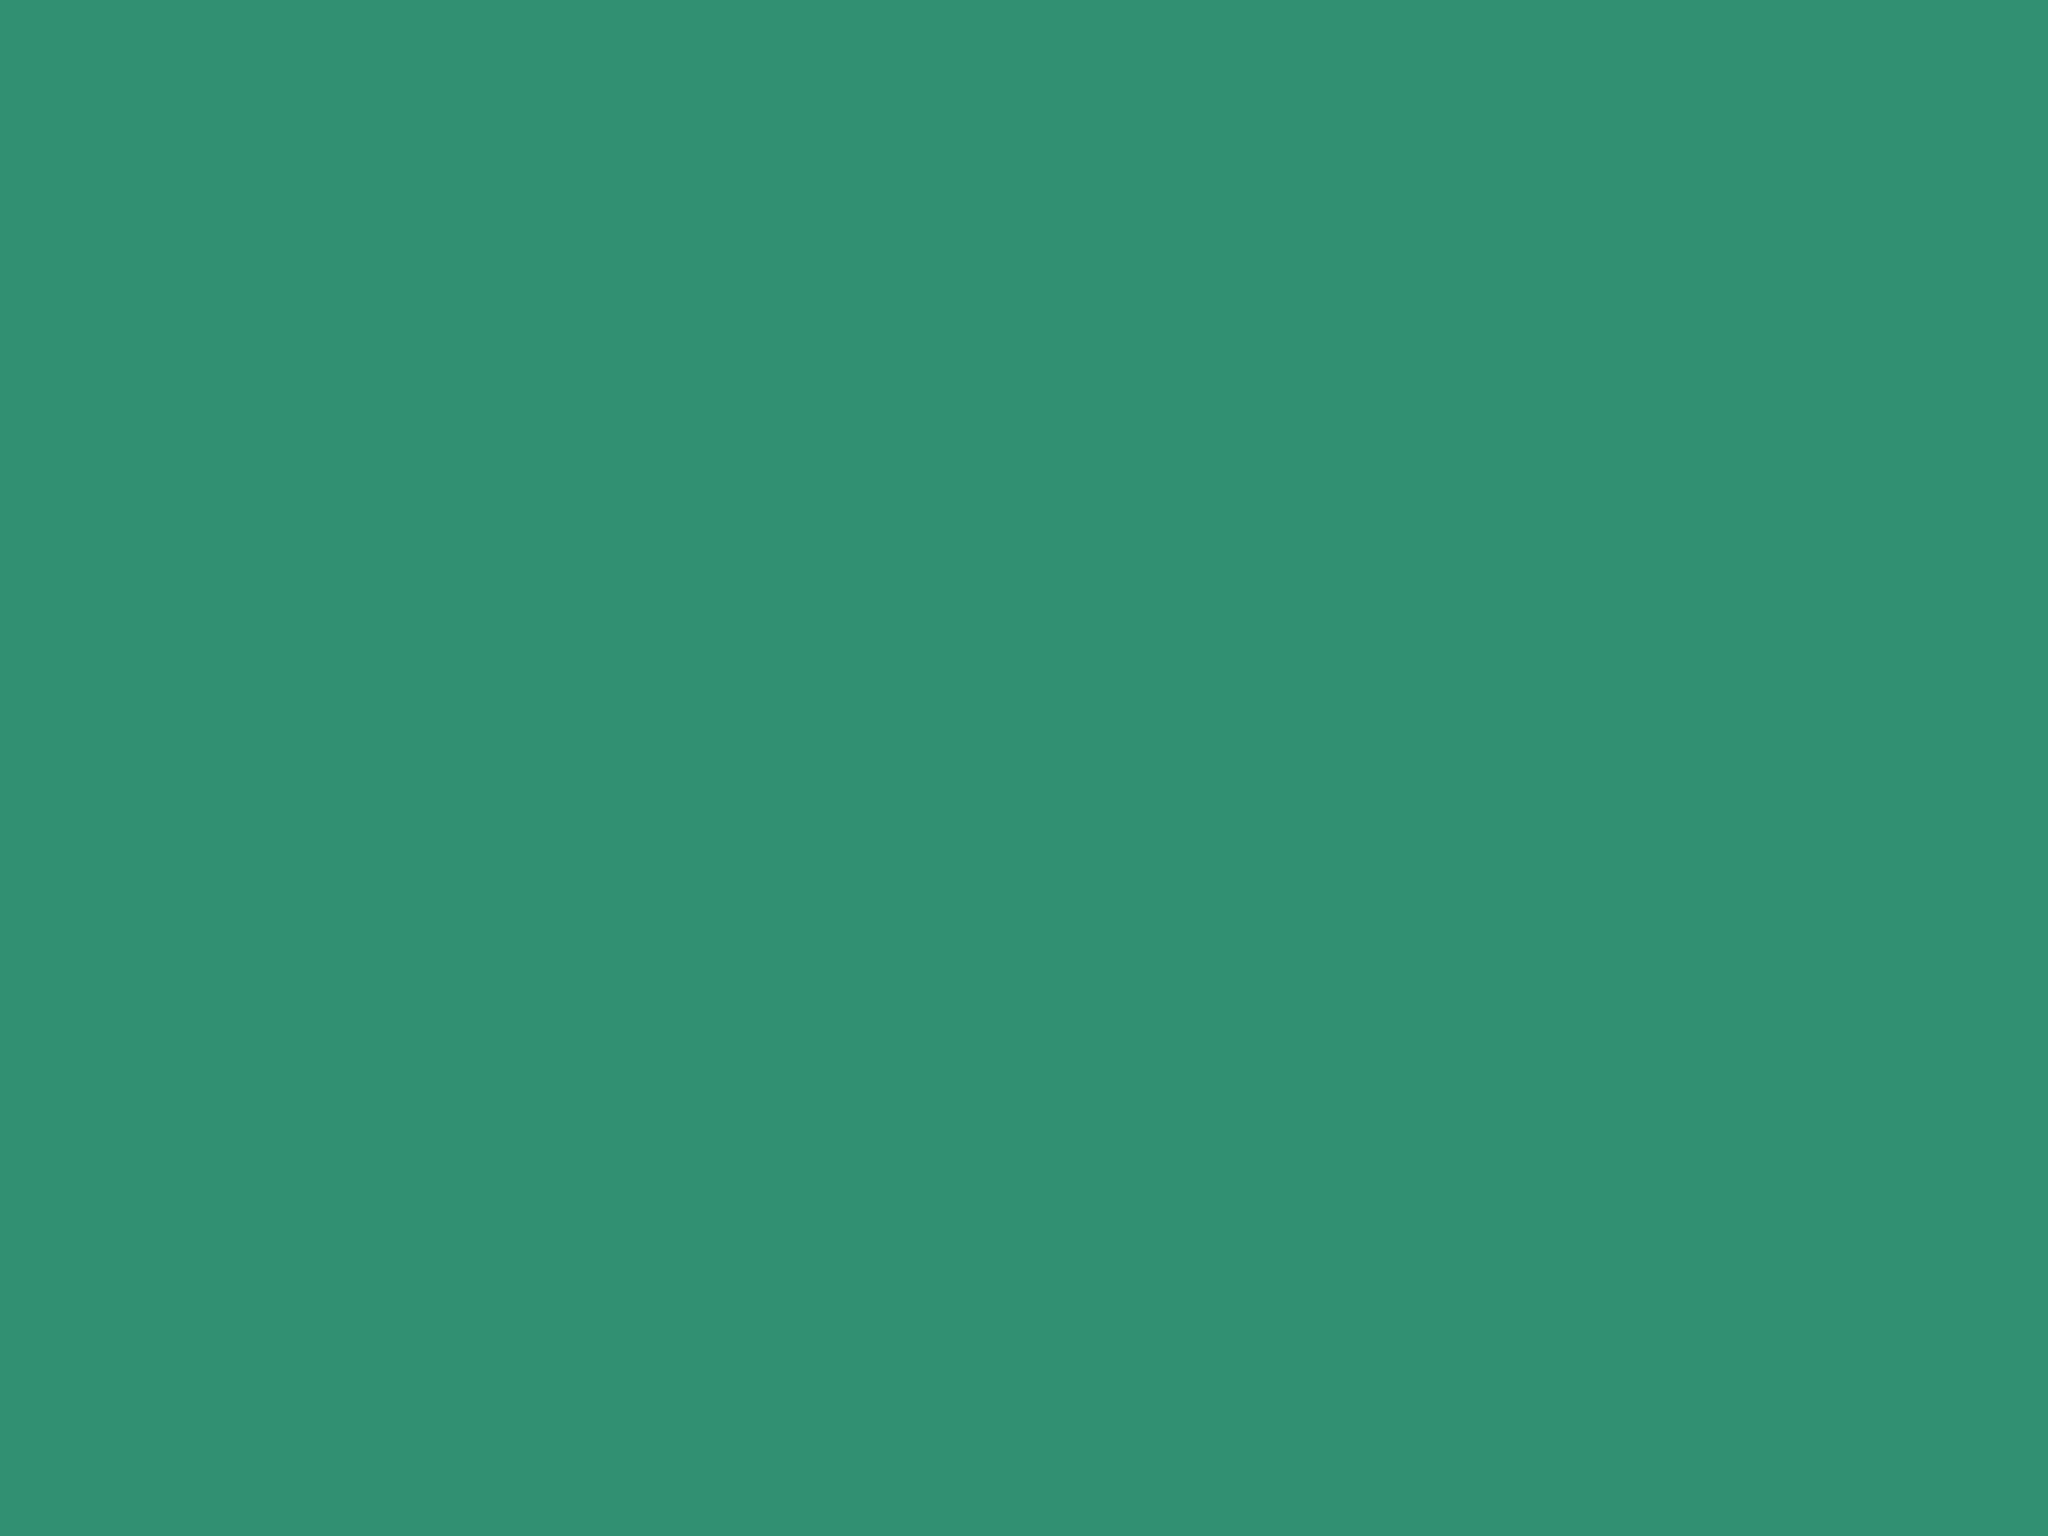 2048x1536 Illuminating Emerald Solid Color Background